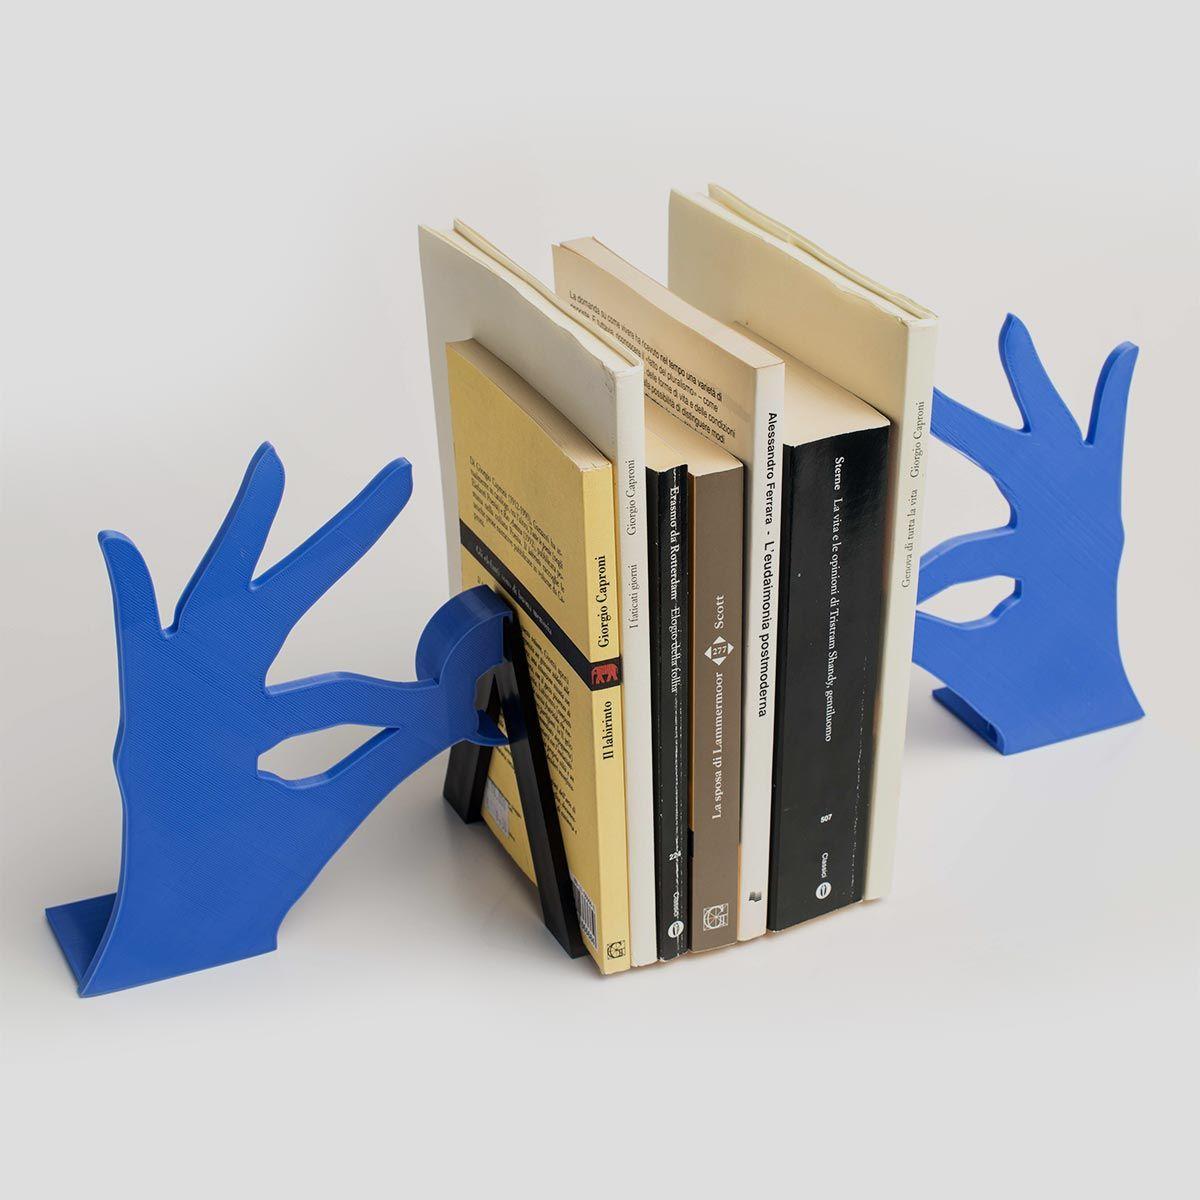 Biblio [Bookends]